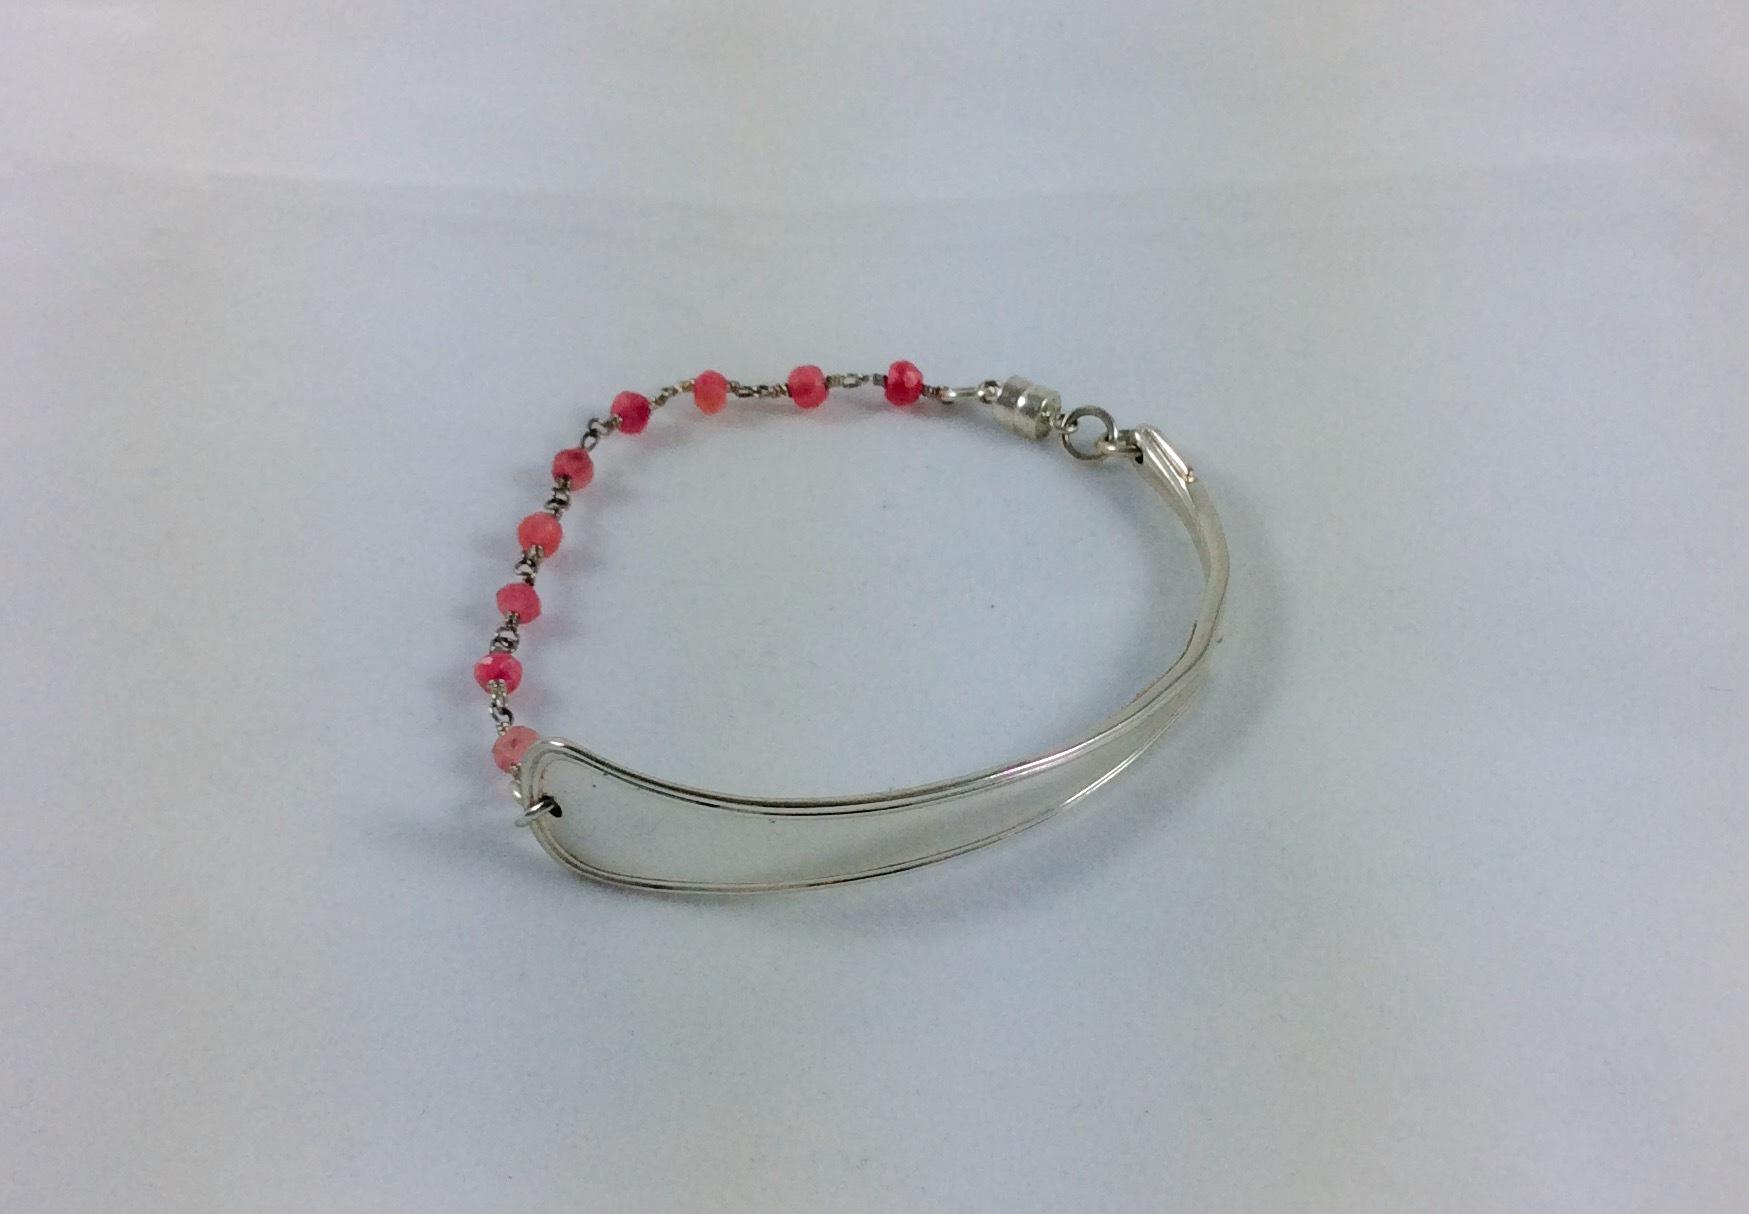 Danish silver and Rose quartz spoon bracelet